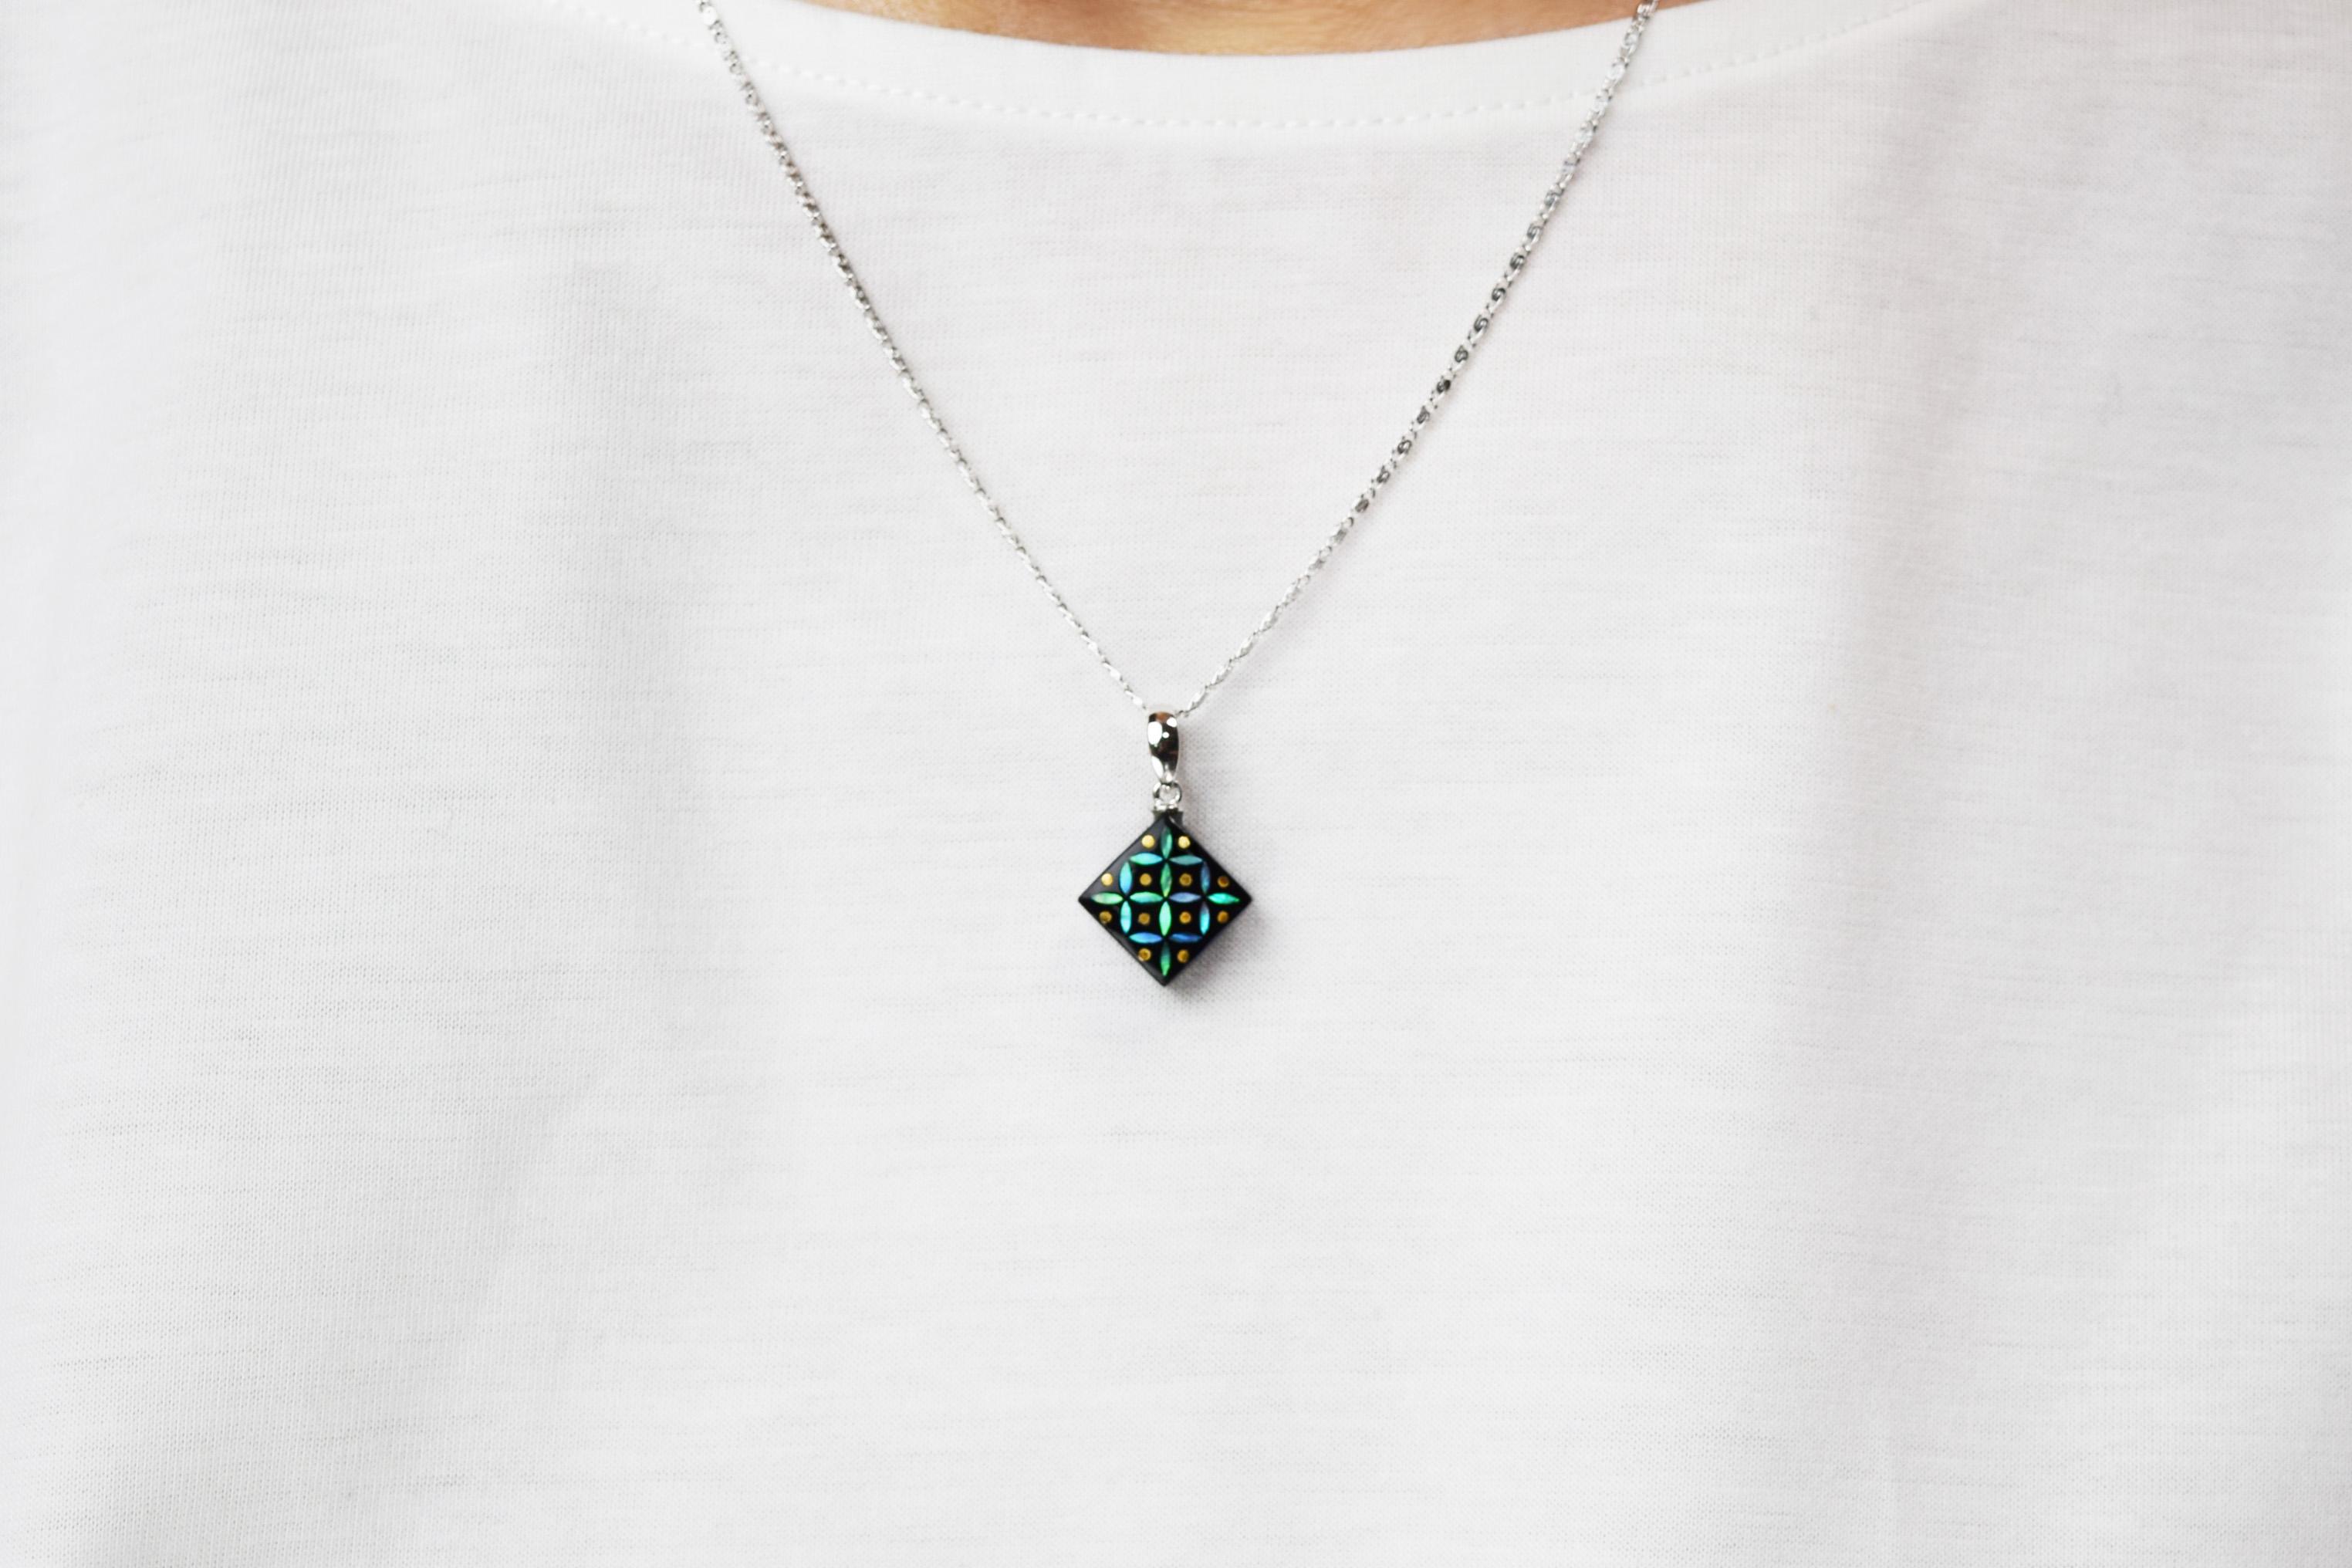 raden_necklace_shippokirikane_s_grn